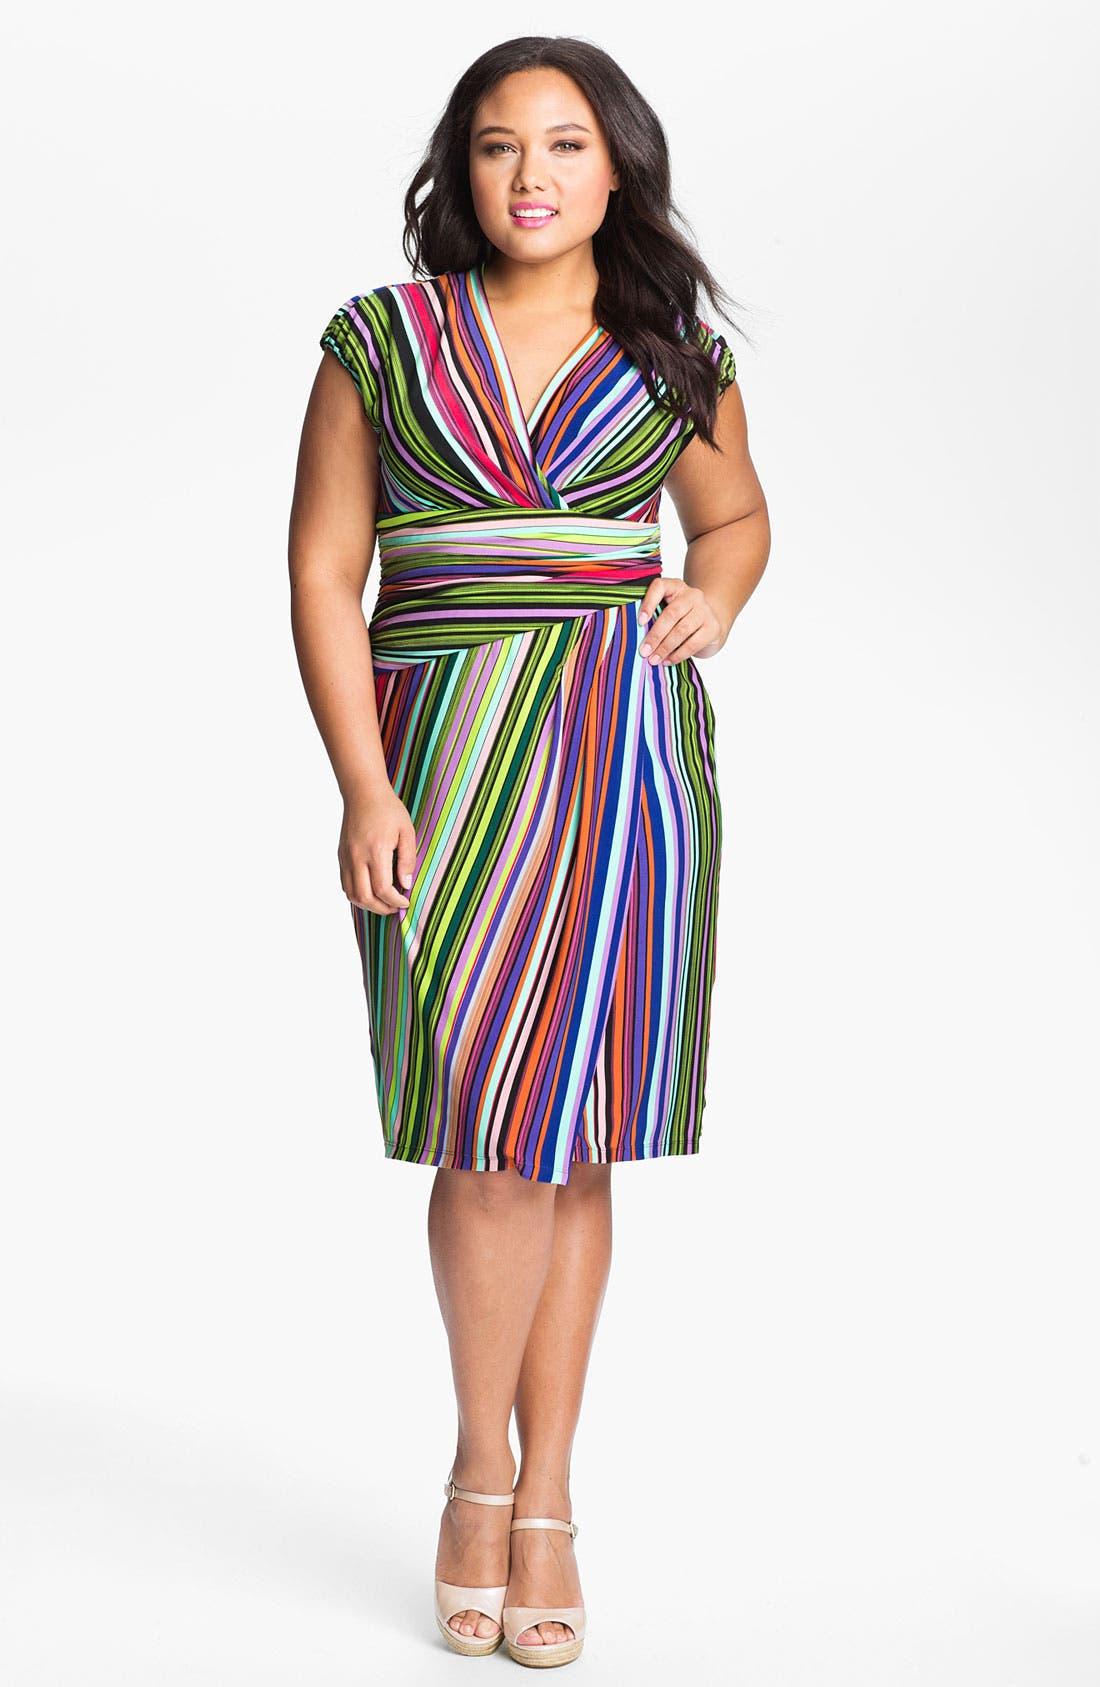 Alternate Image 1 Selected - Suzi Chin for Maggy Boutique Stripe Jersey Faux Wrap Dress (Plus Size)